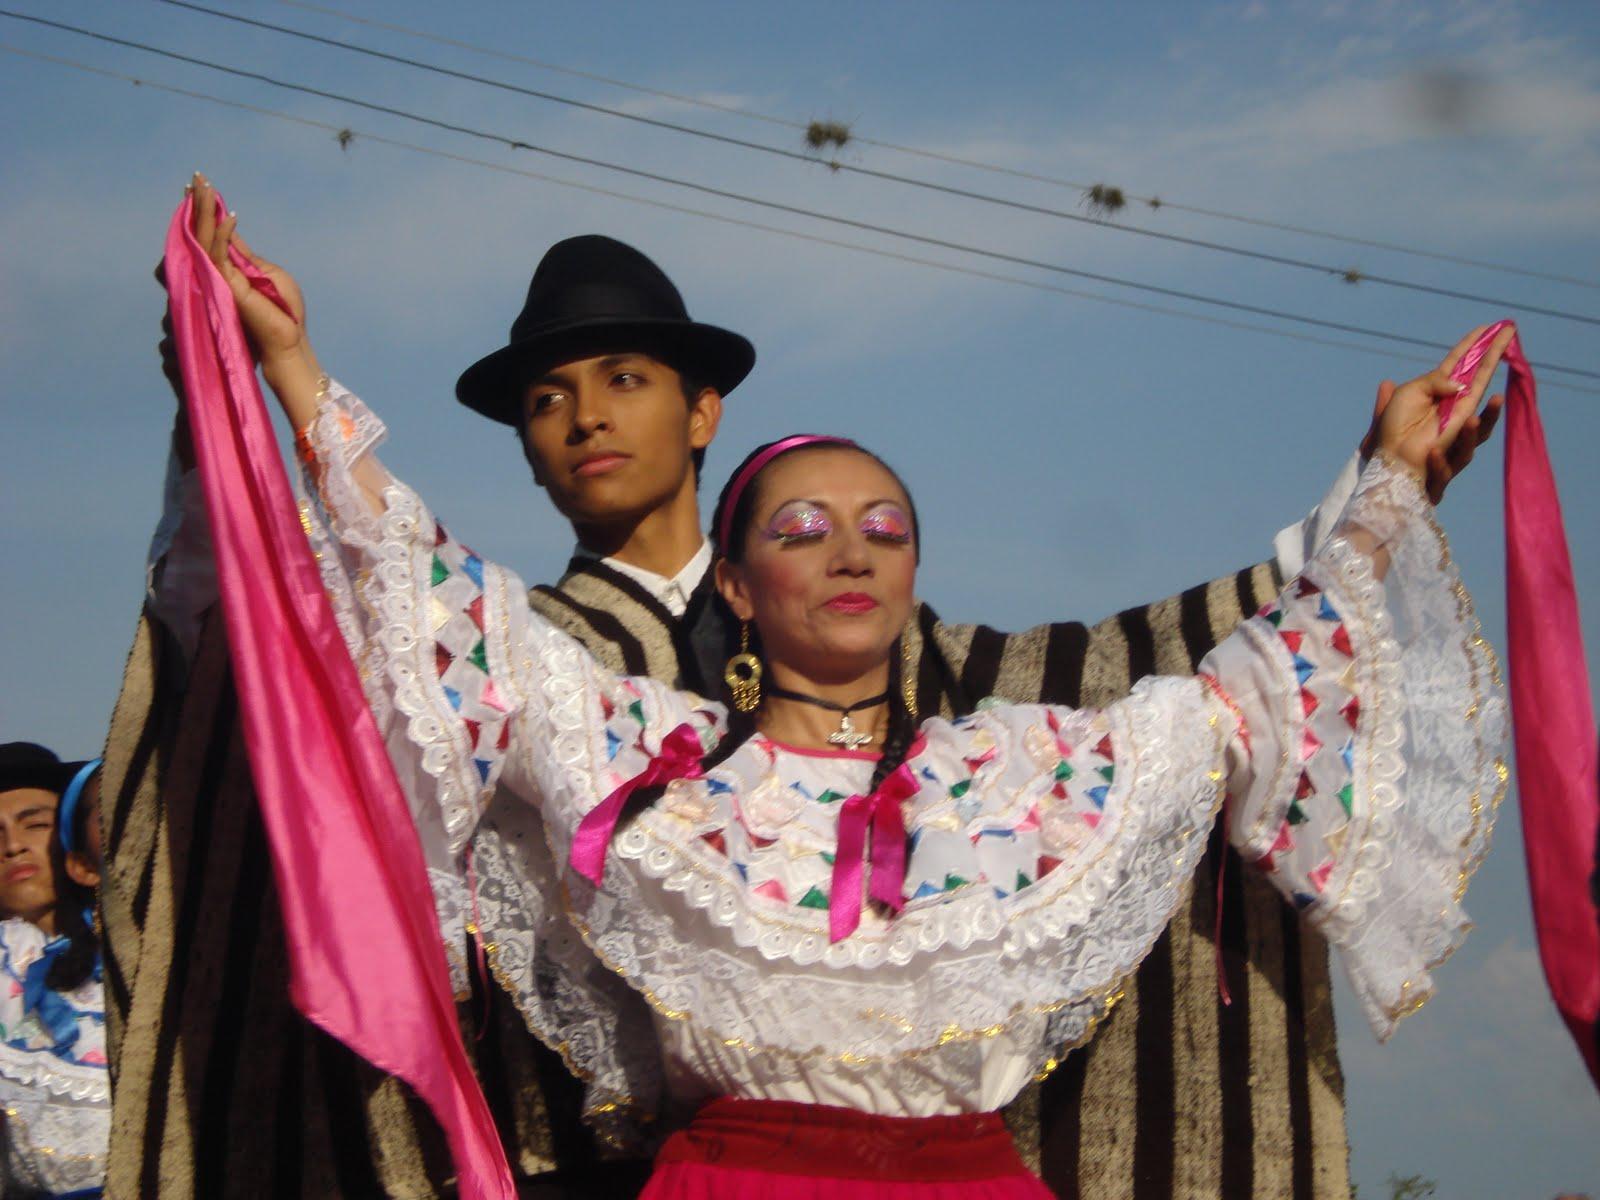 Ritmo Latinoamericano El San Juanito En La Frontera